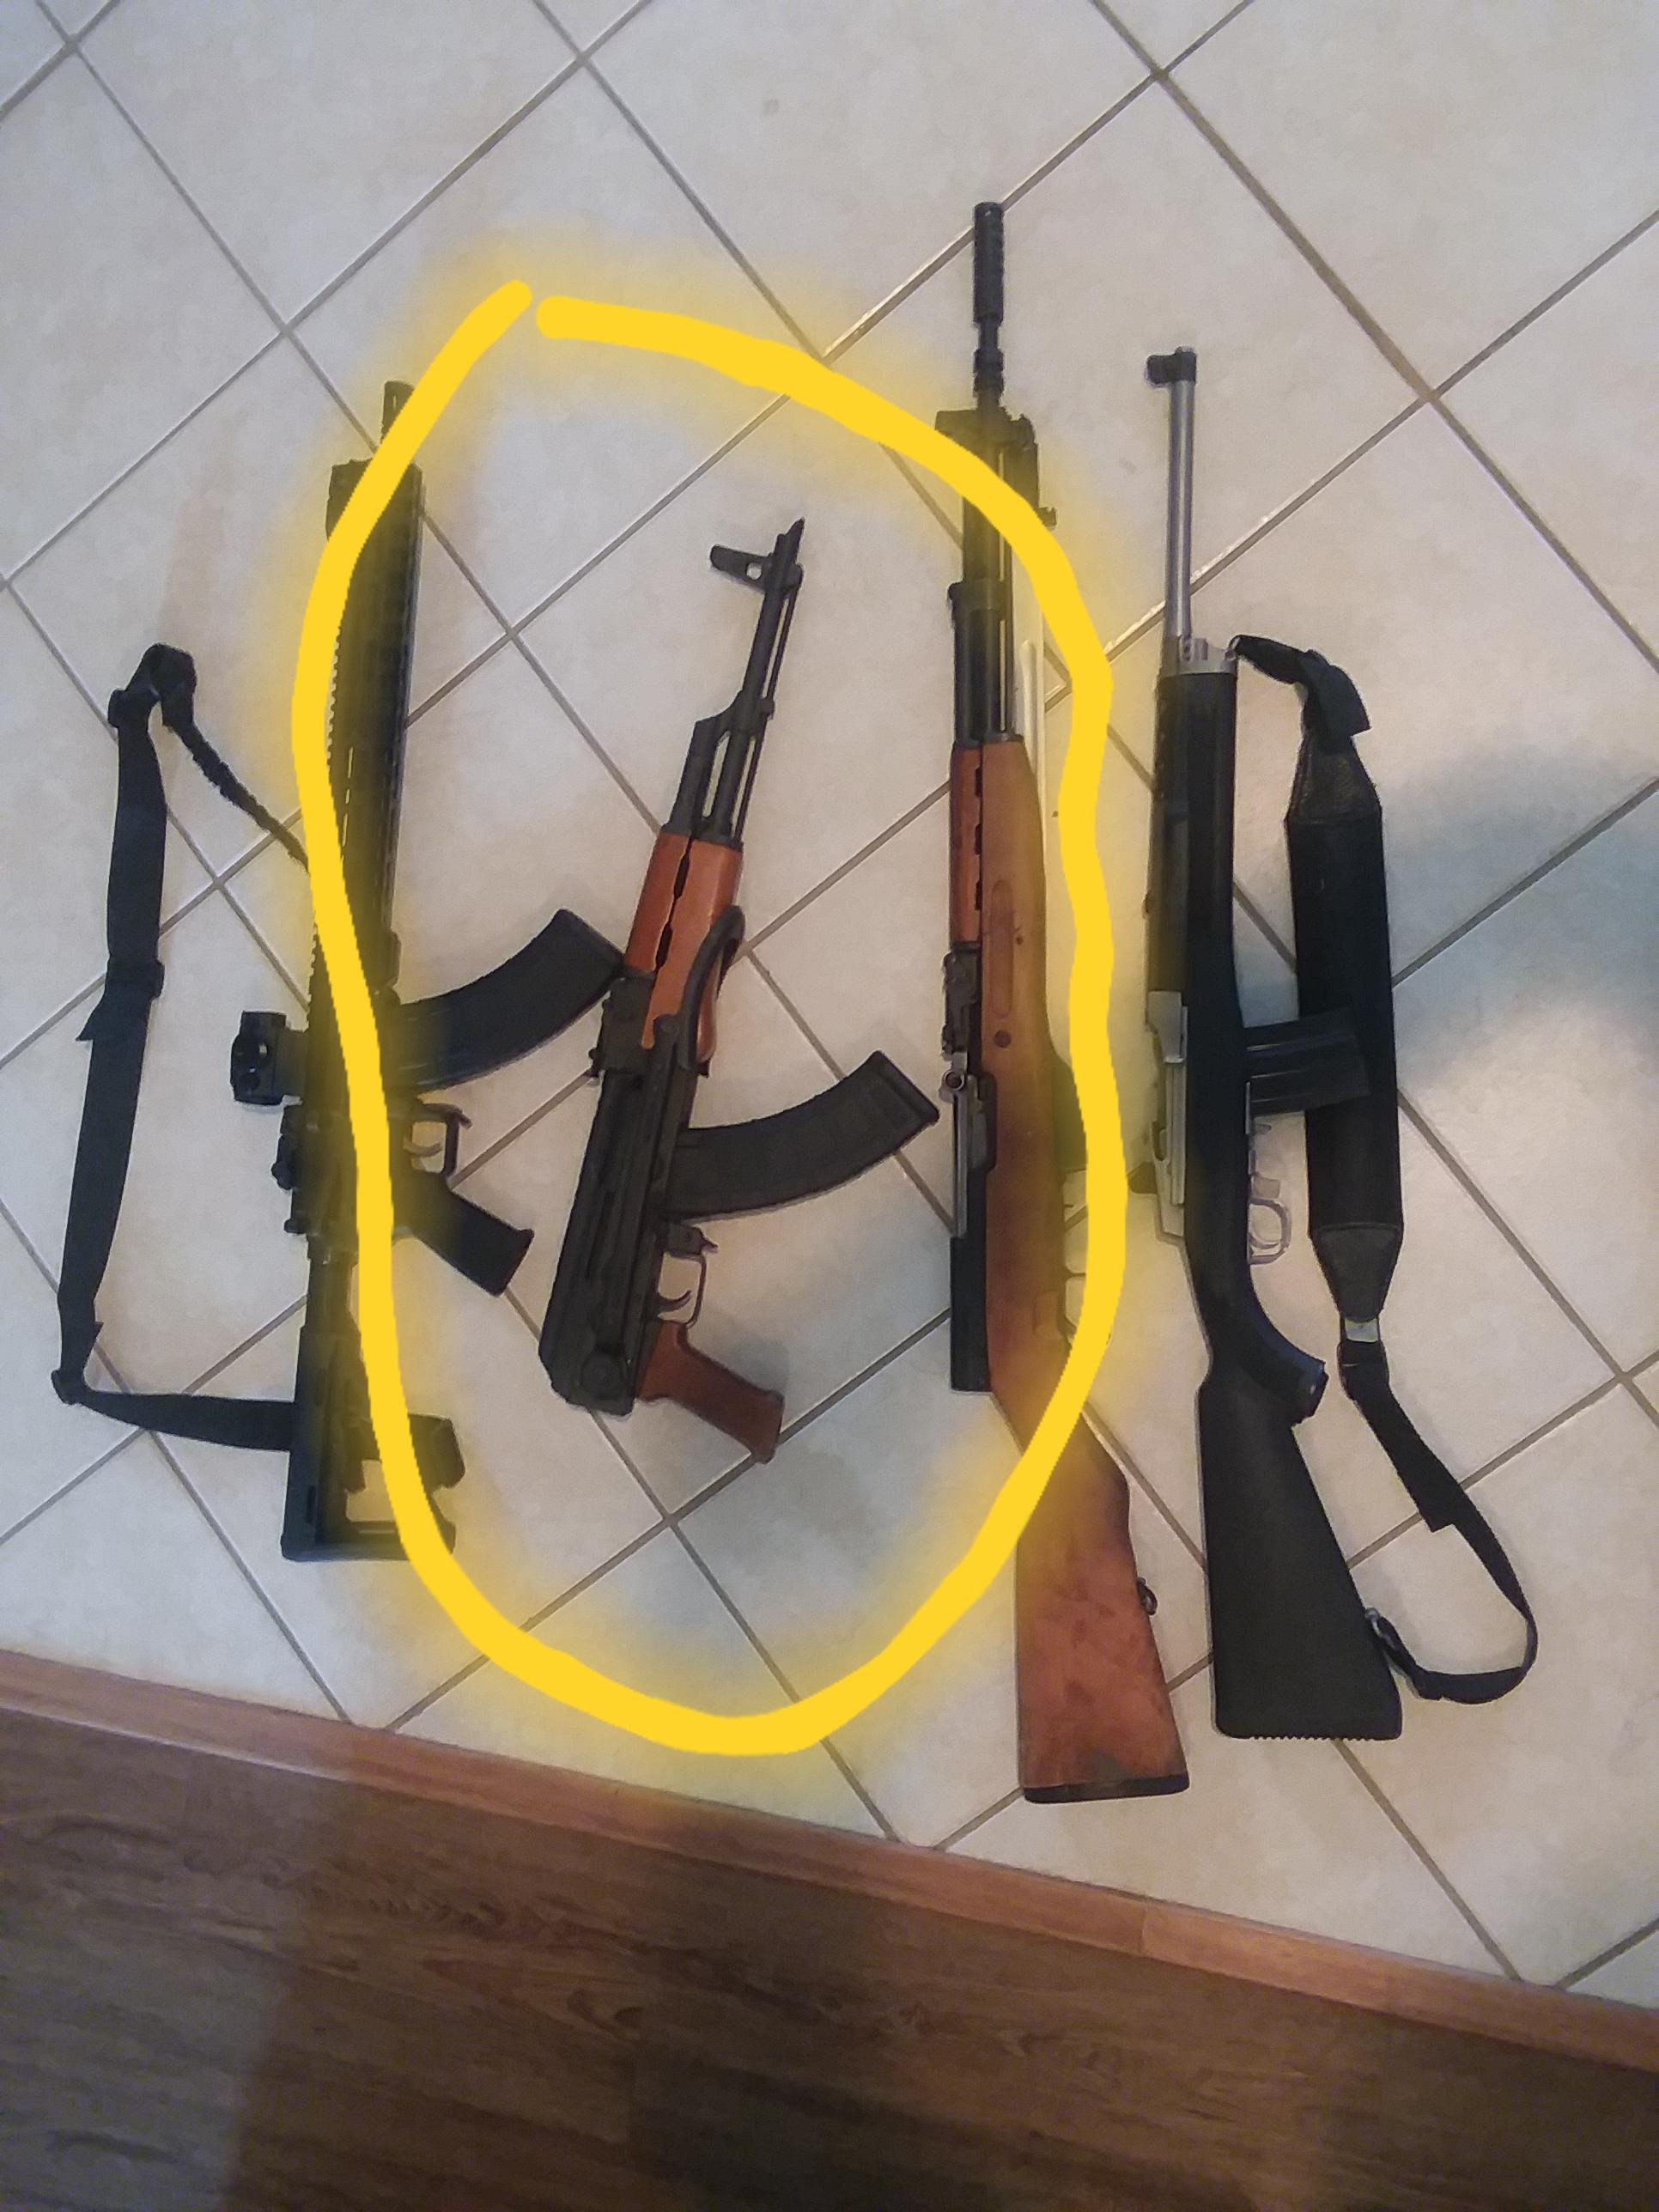 The perfect travel long gun?-20190915_193315.jpg